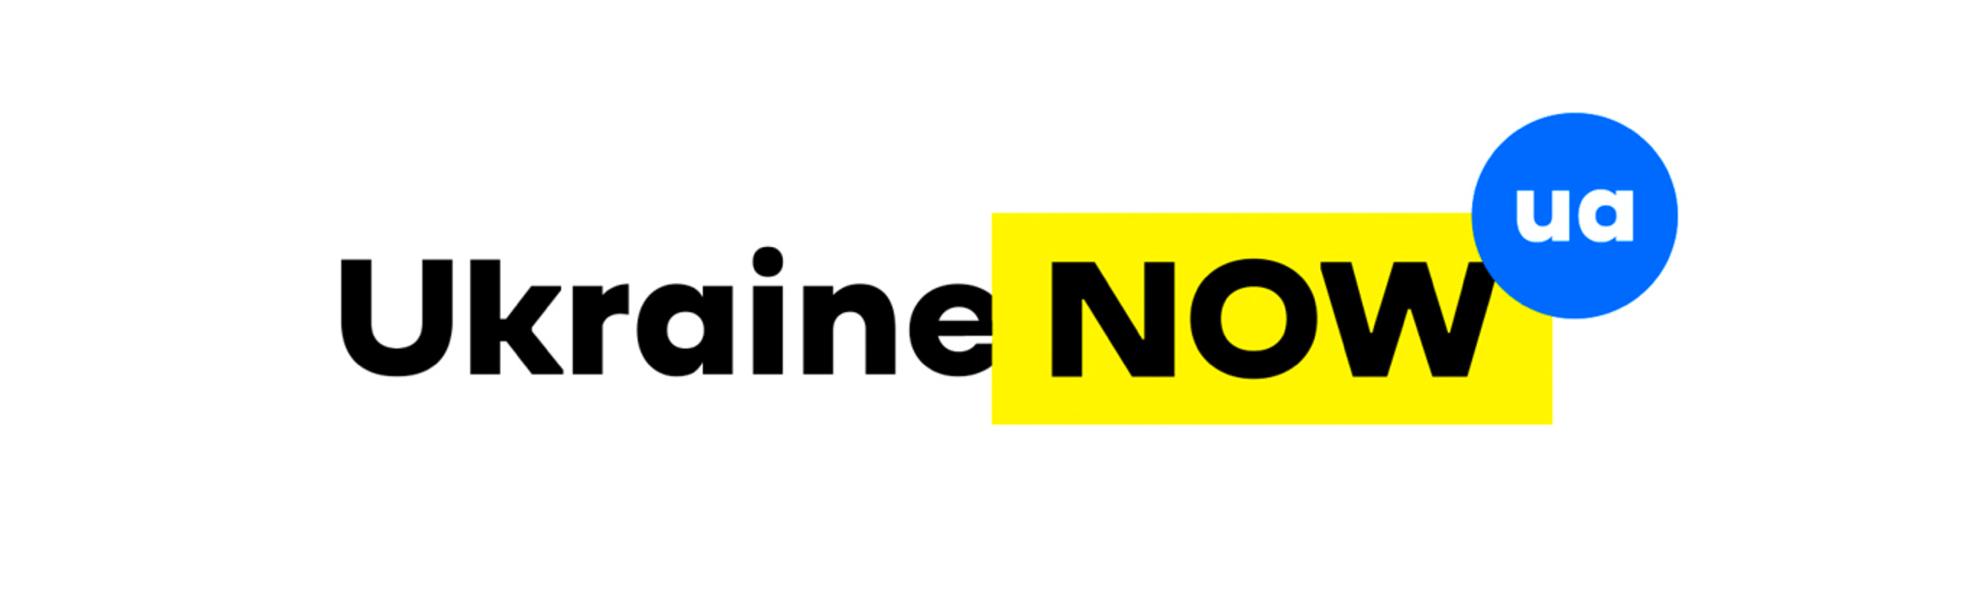 nowe logo ukrainy